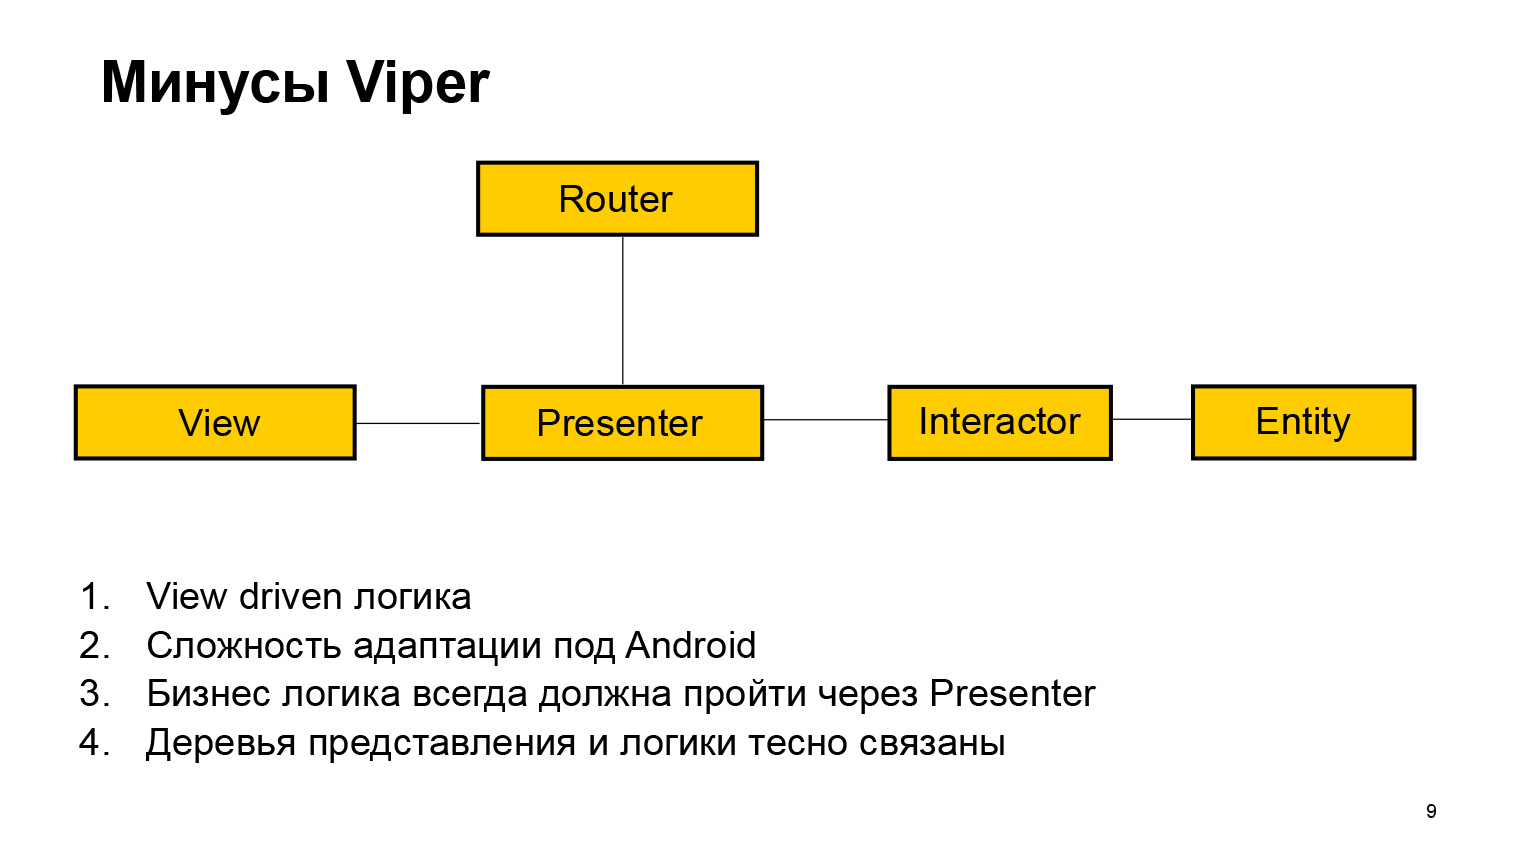 Как мы внедряли архитектуру RIBs. Доклад Яндекс.Такси - 5